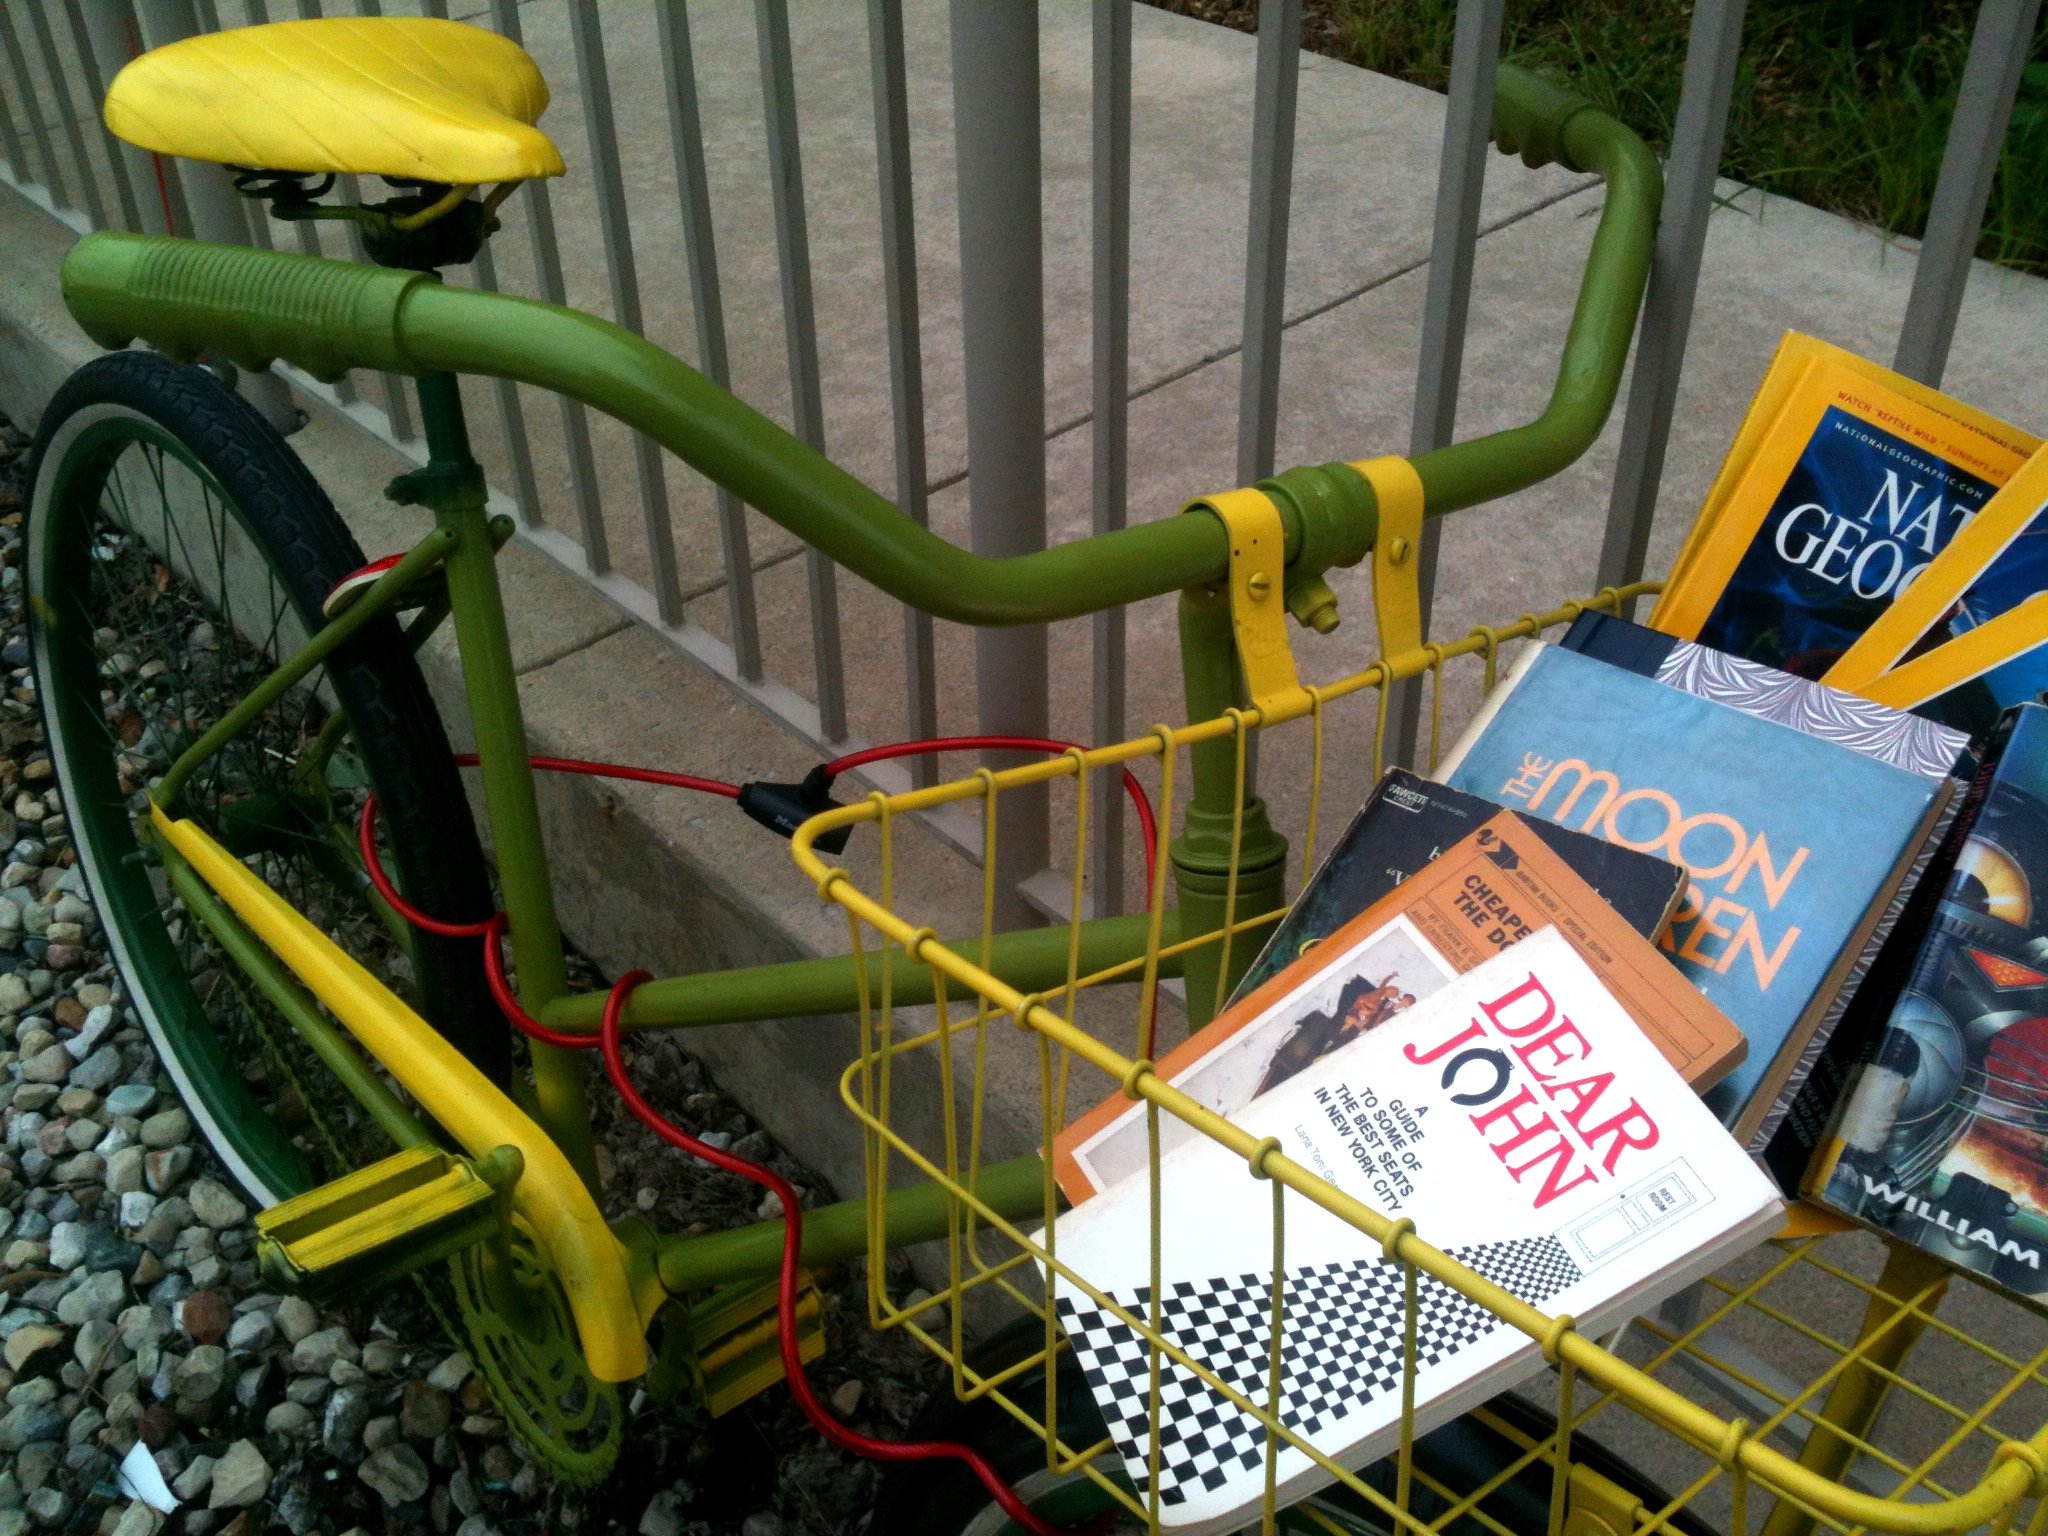 Artsy Bike with Books